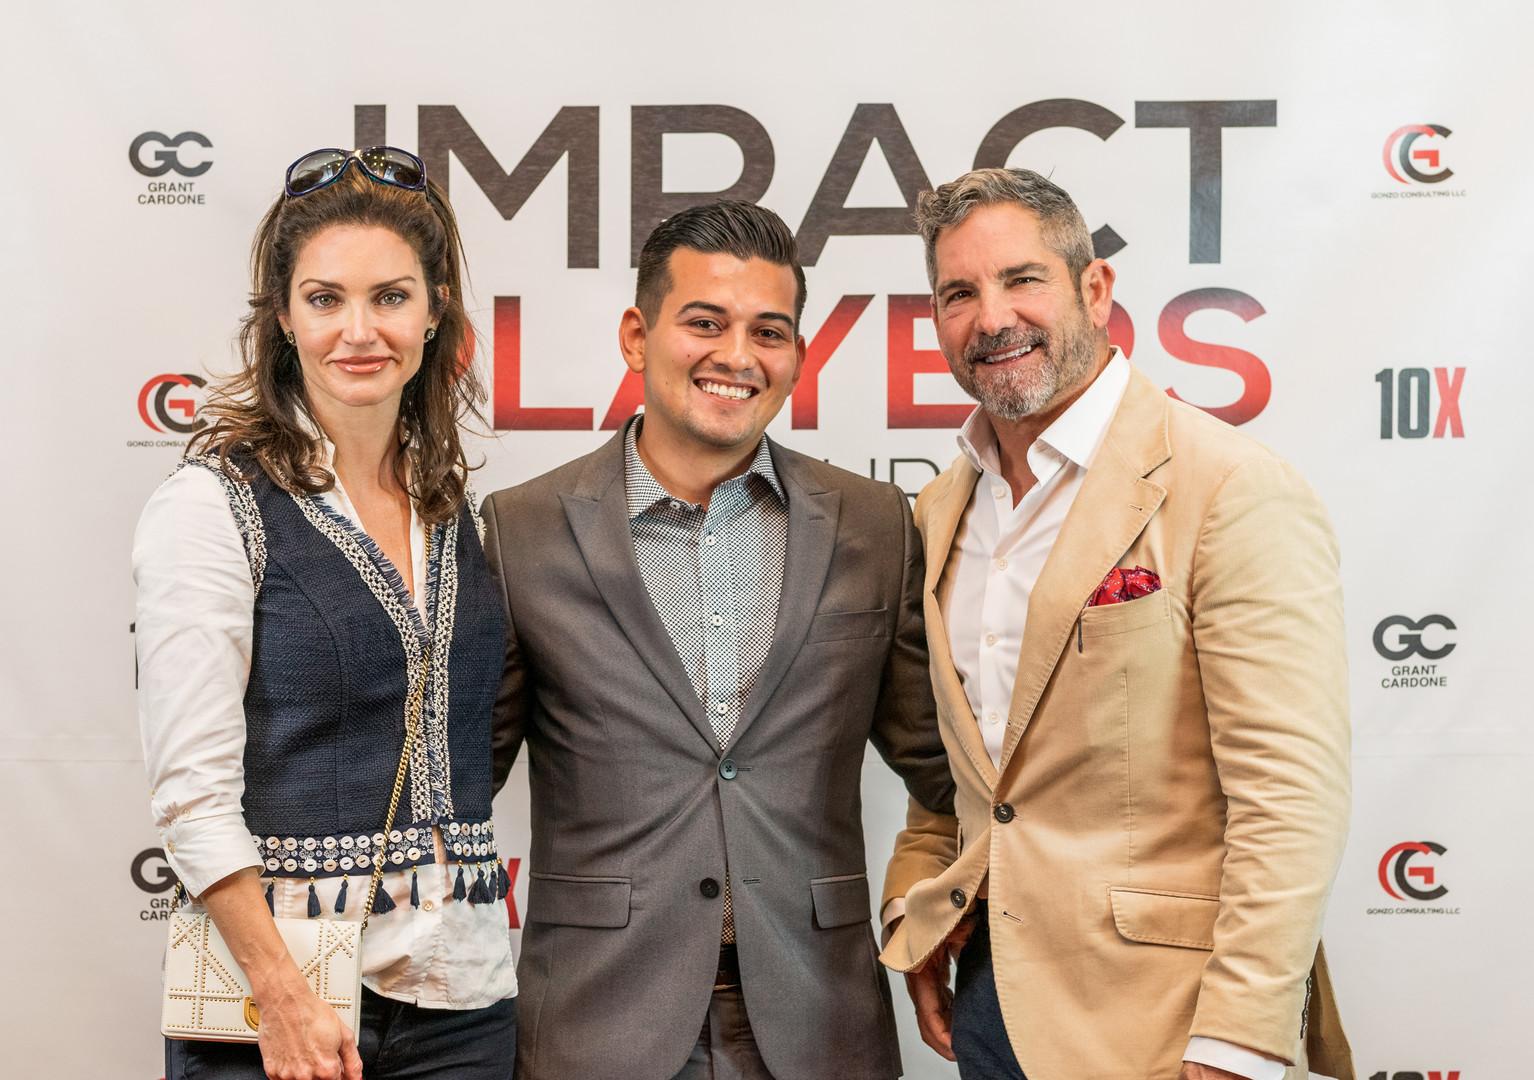 Grant & Elena Cardone and Ruben Alvarez